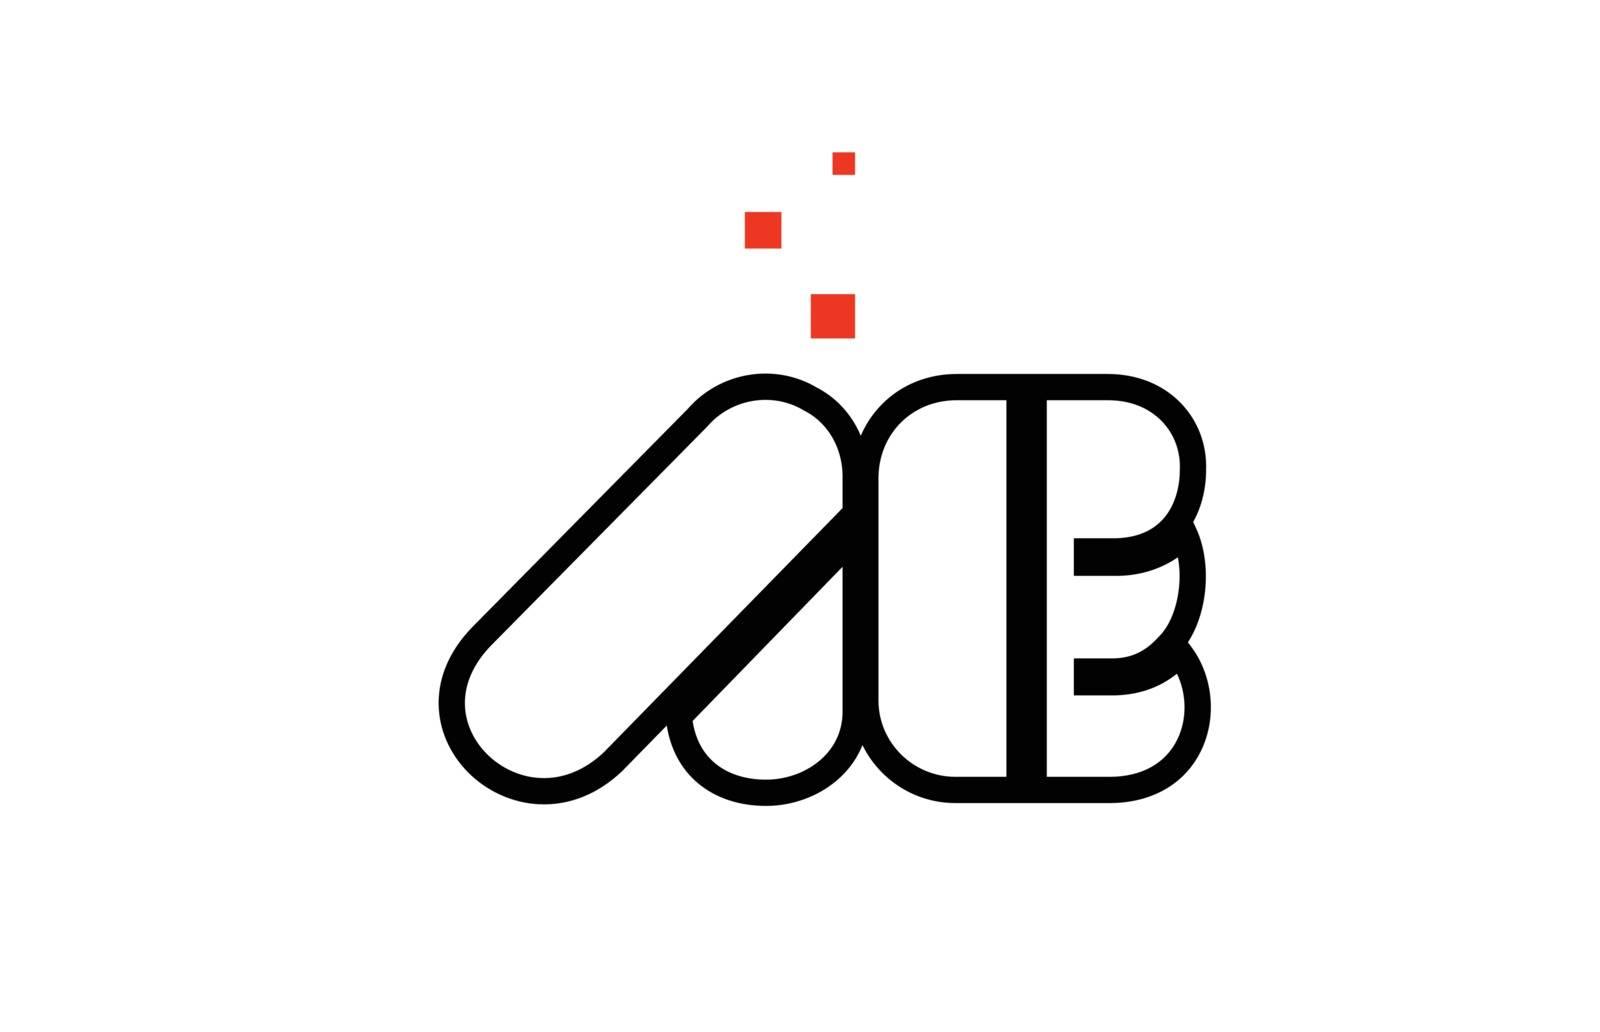 AE A E black white red alphabet letter combination logo icon des by dragomirescu